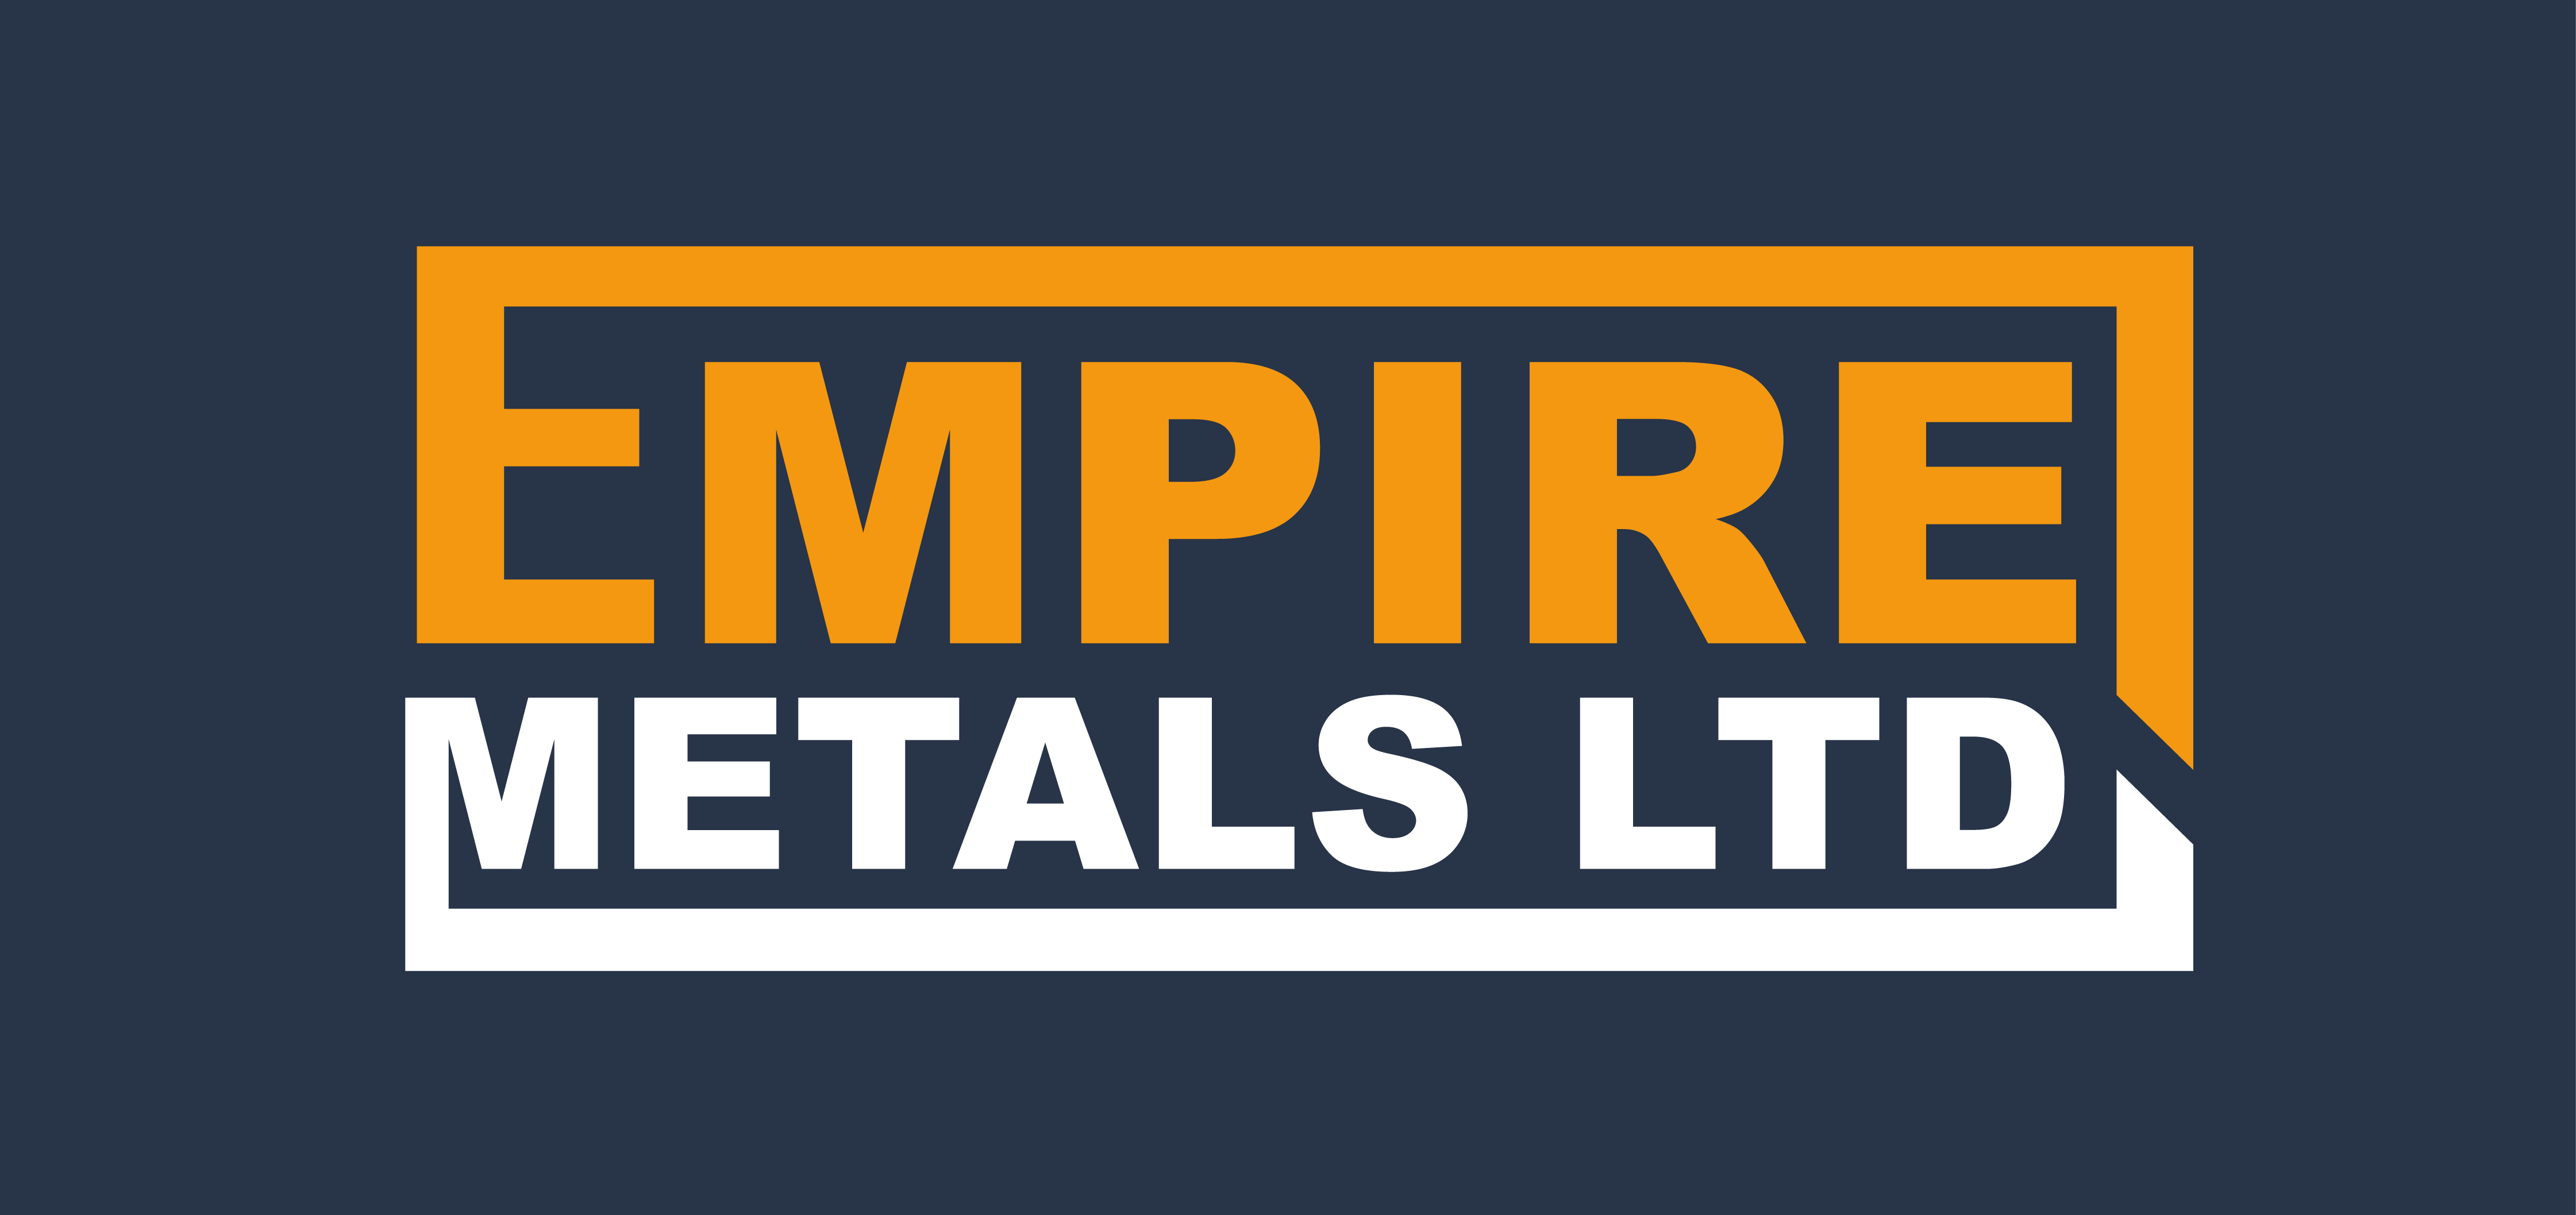 EMPIRE METALS LIMITED Logo